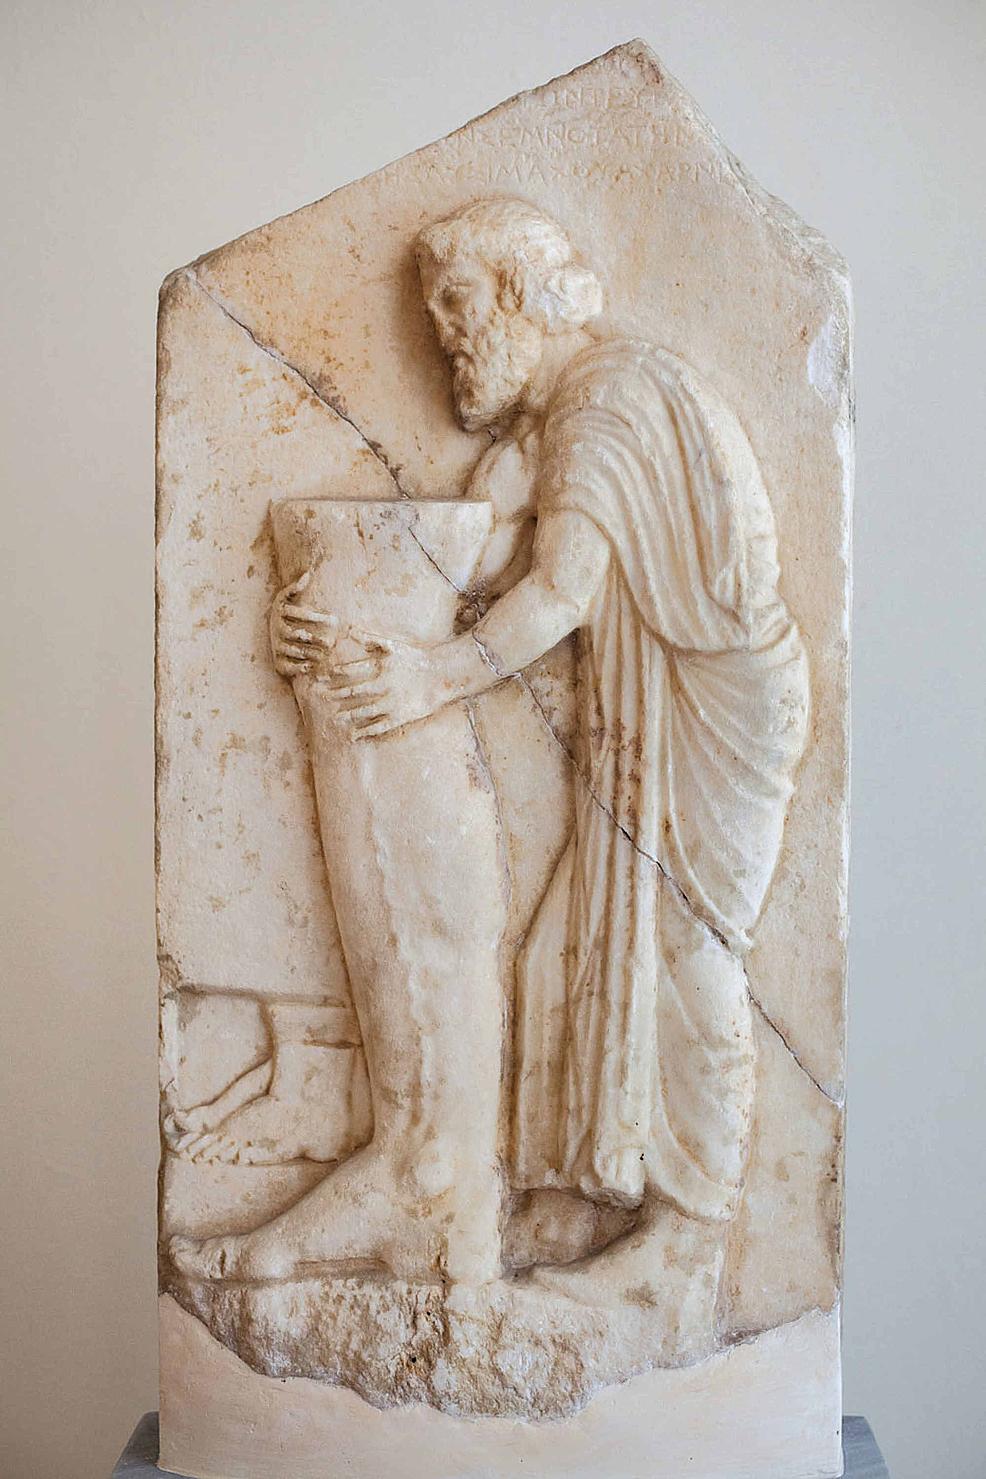 Votive-relief-found-near-Enneakrouno,-Athens